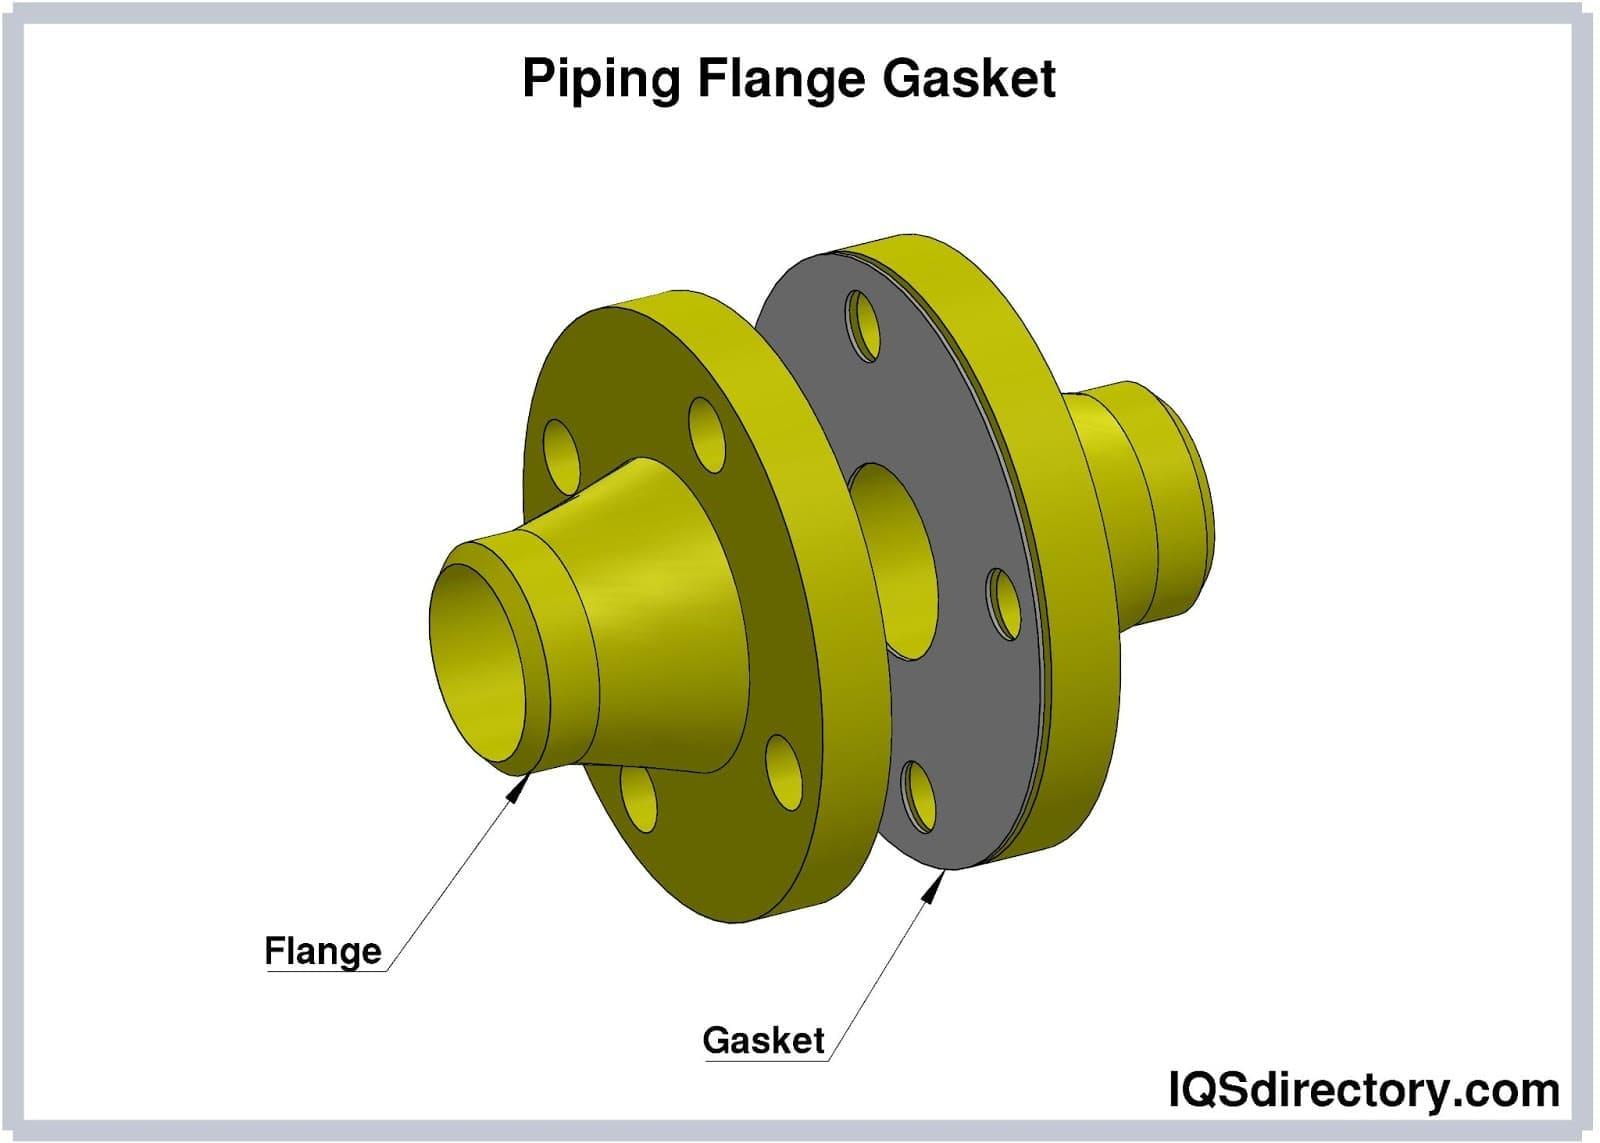 Piping Flange Gasket